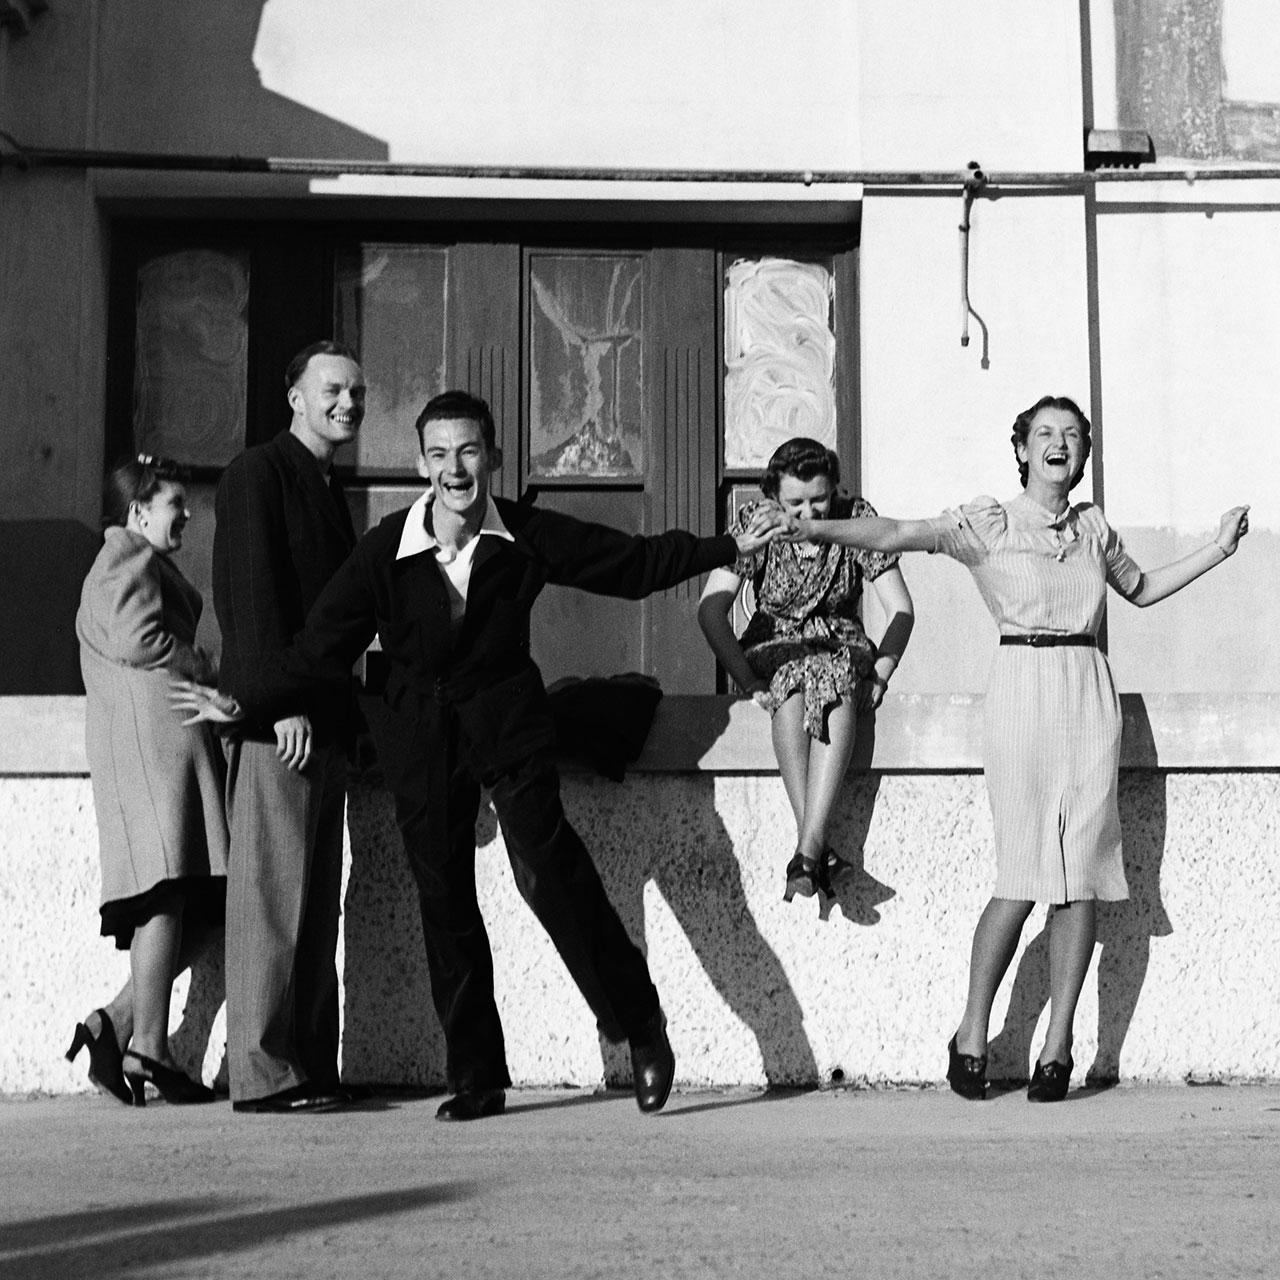 George dancing outside dance hall, North Bondi, 25 August 1940. (Digital ID: a2391050)